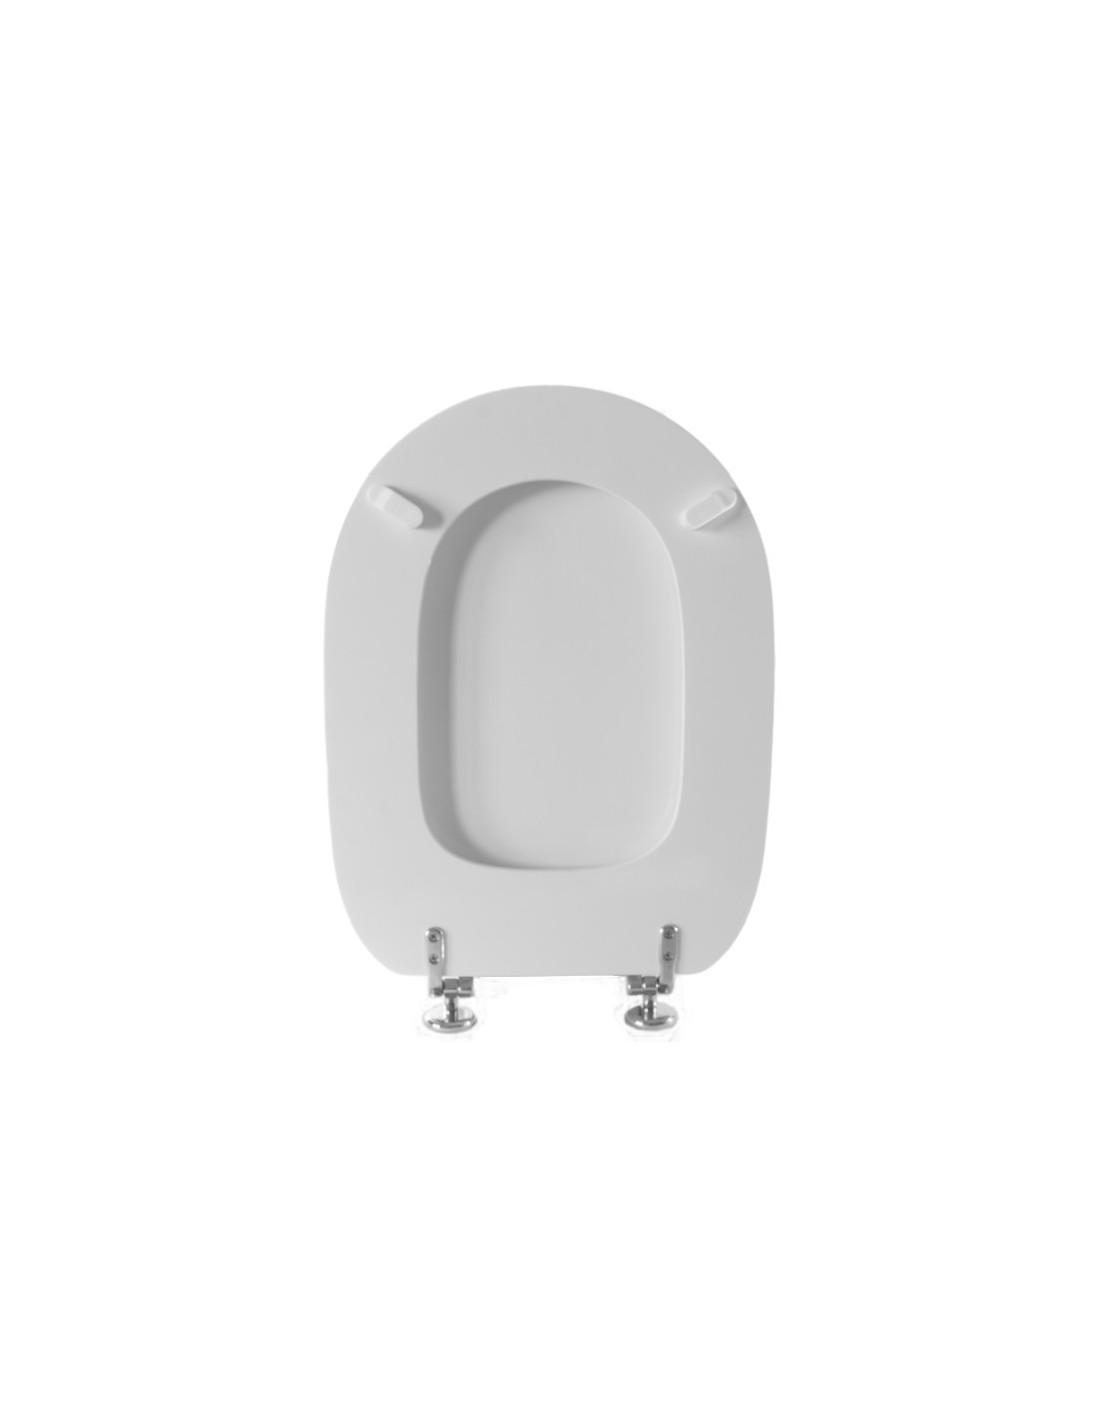 Seat Wc Ideal Standard Liuto Adaptable In Resiwood Tapadelwater